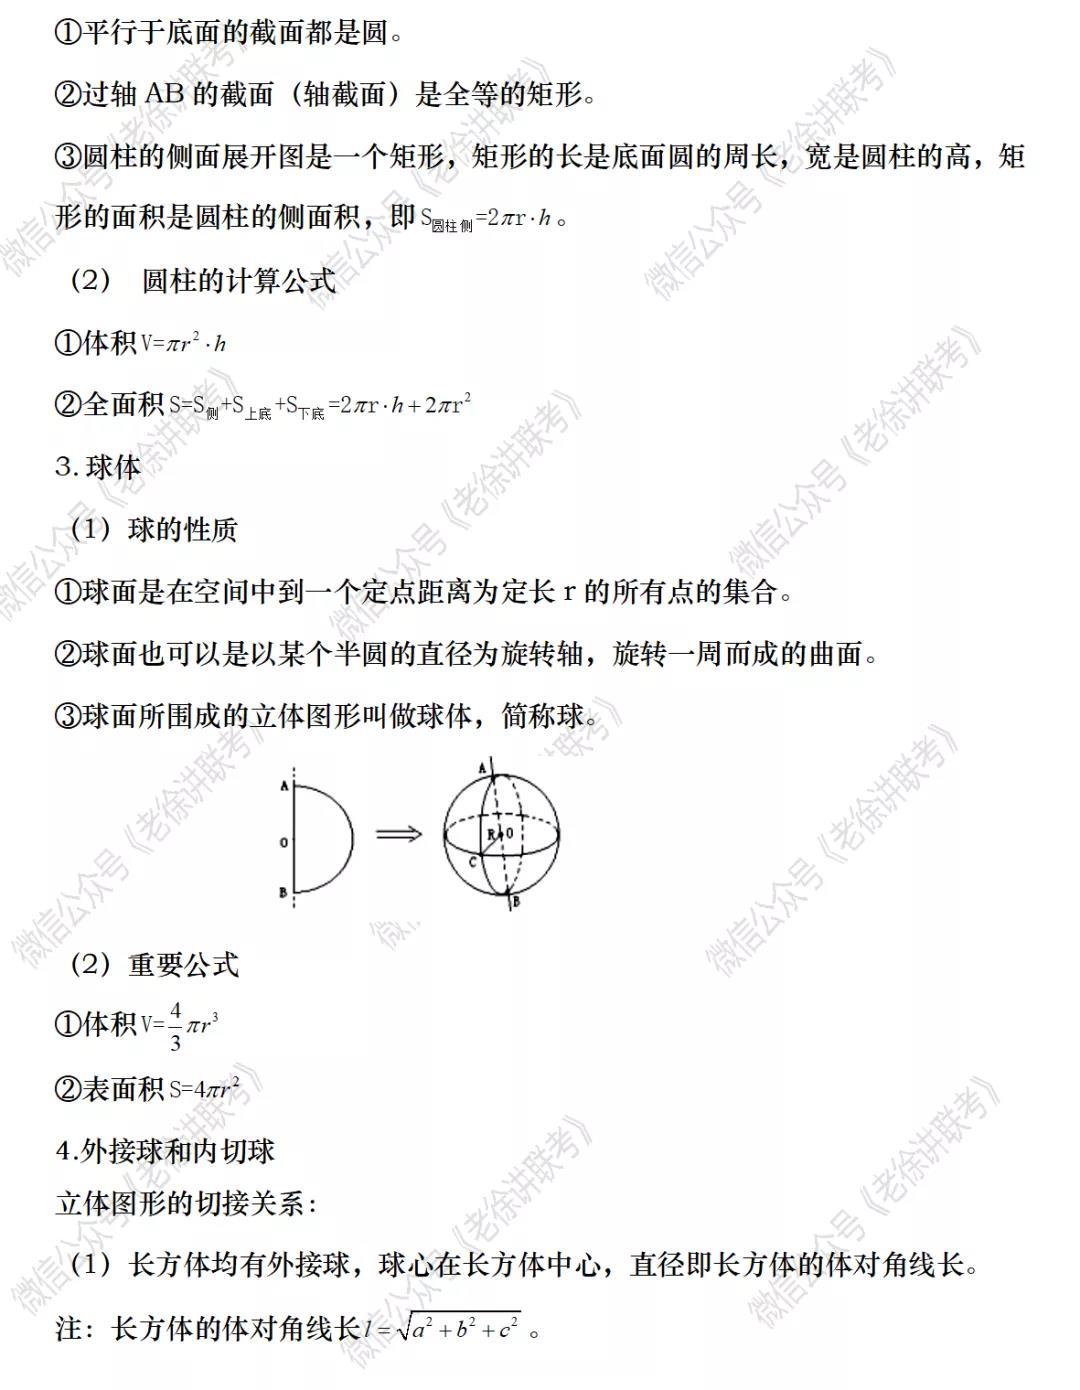 2022MBA考研|管理类联考:数学专题训练-立体几何(第一期)